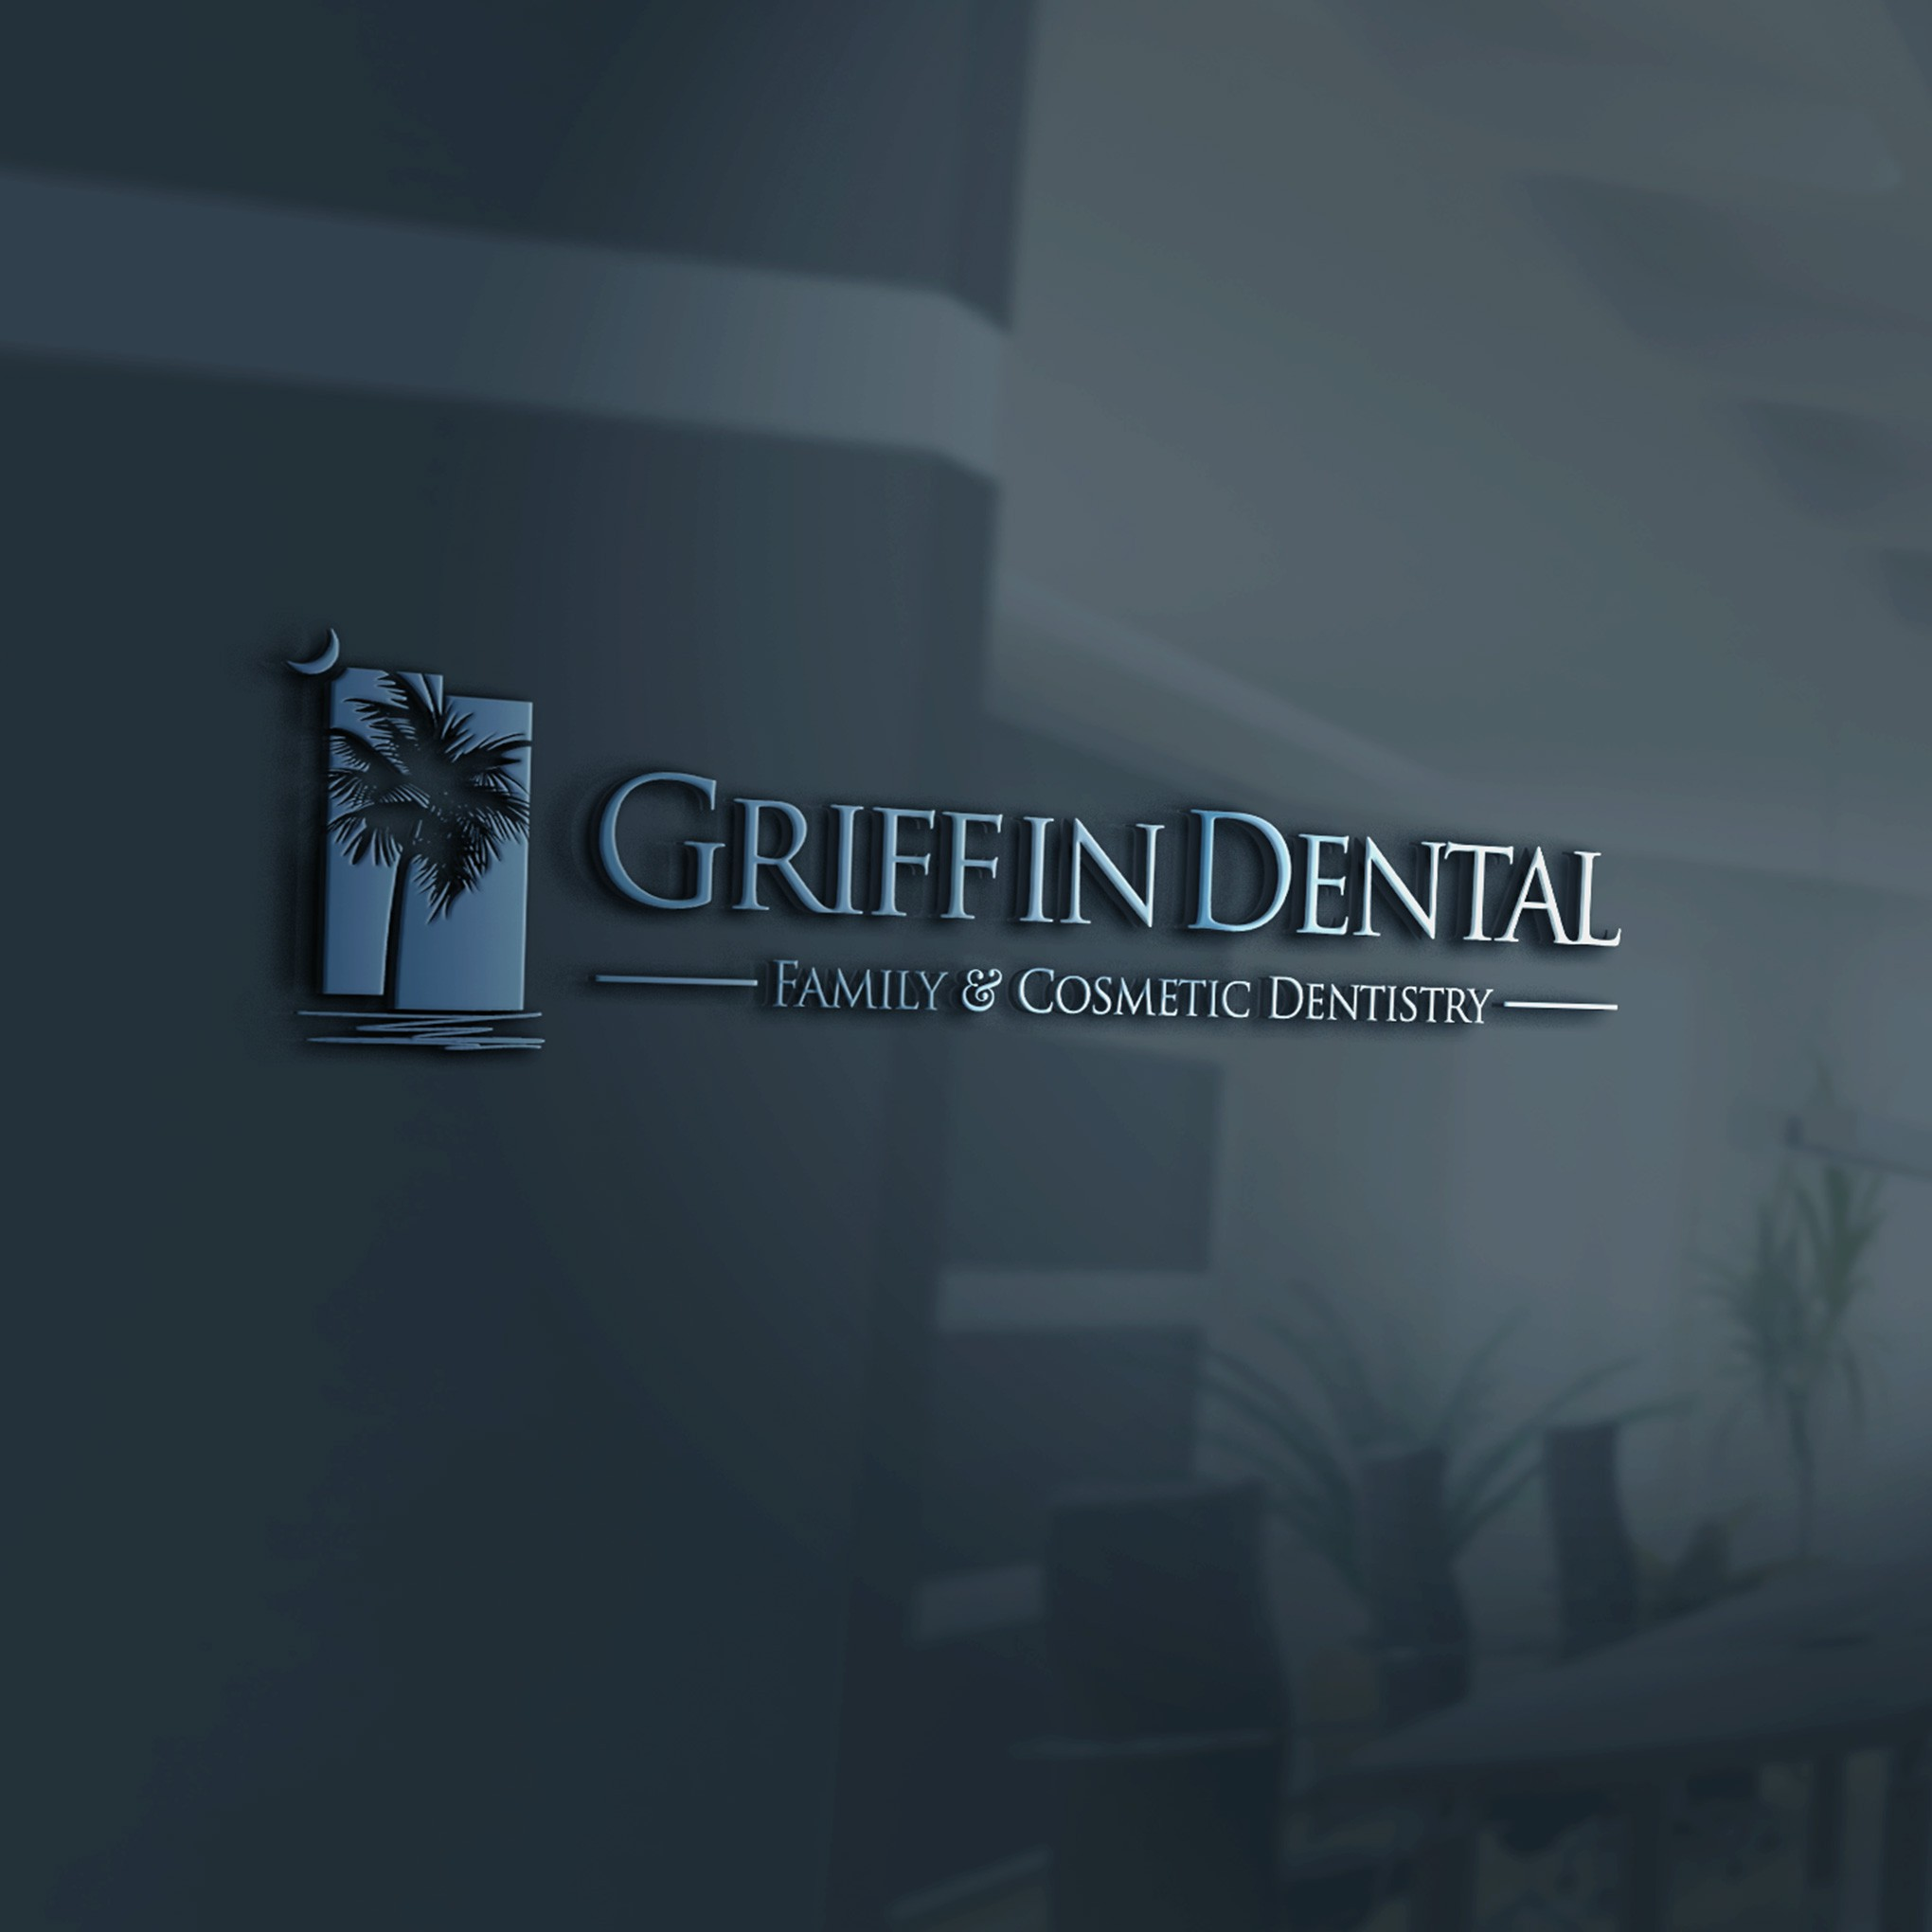 New Dental Office needs a fresh identity